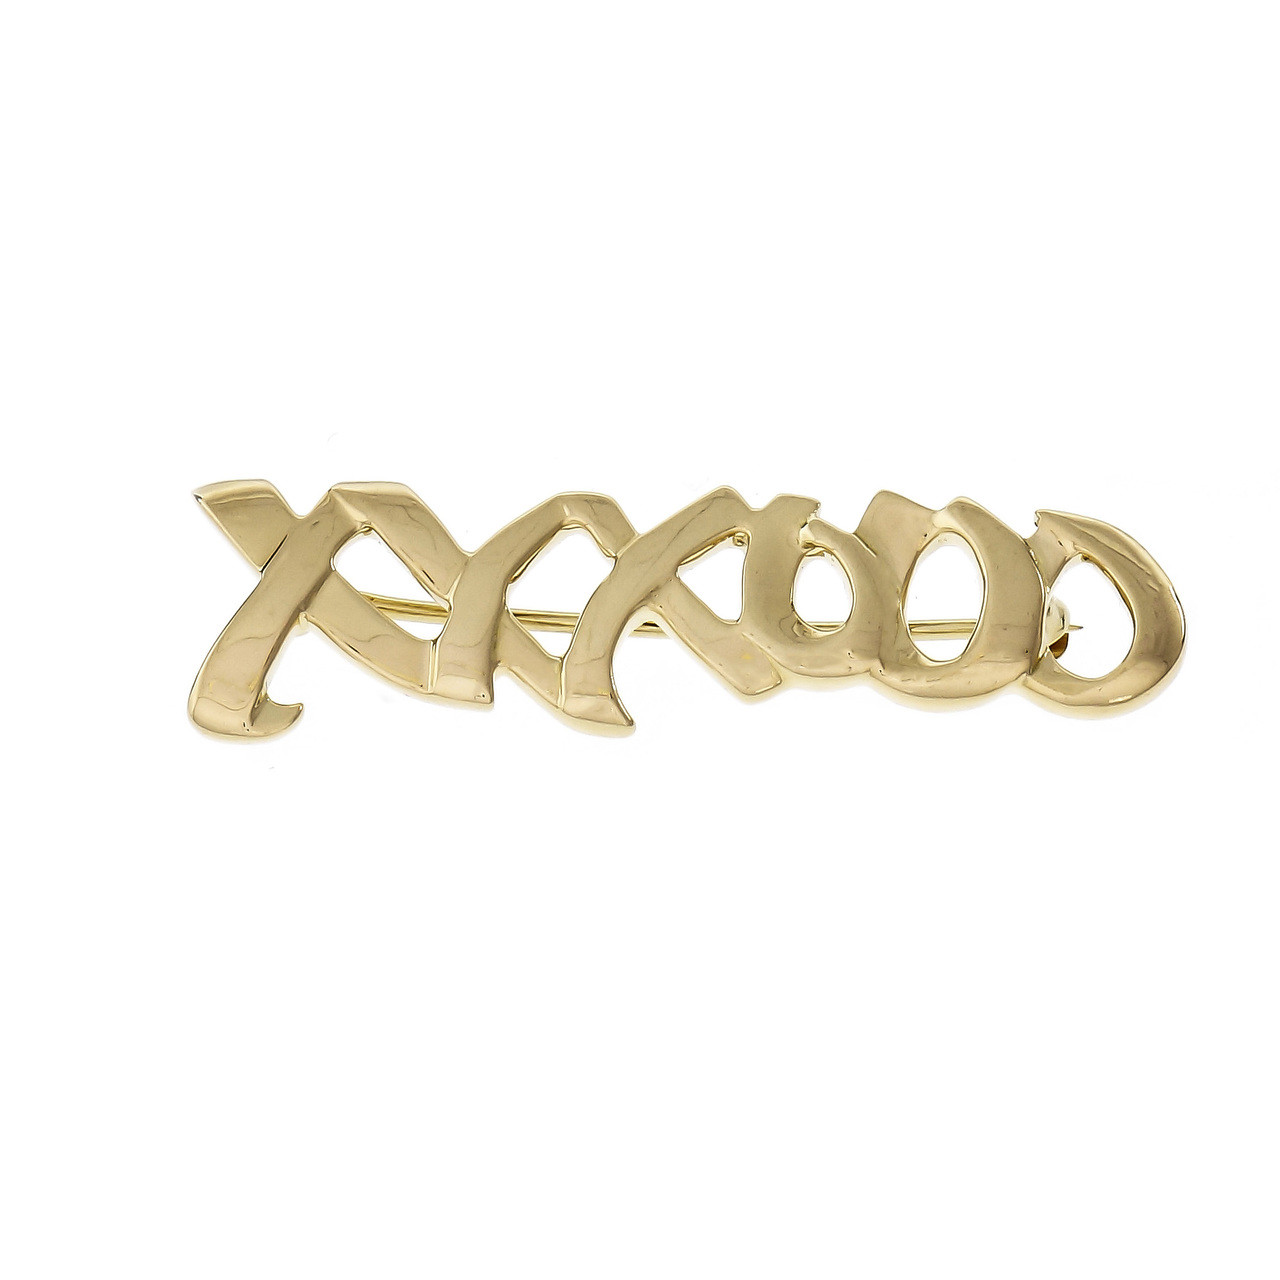 "94ae70968 Tiffany & Co Paloma Picasso ""XO"" Signature 18k Gold Pin - petersuchyjewelers"